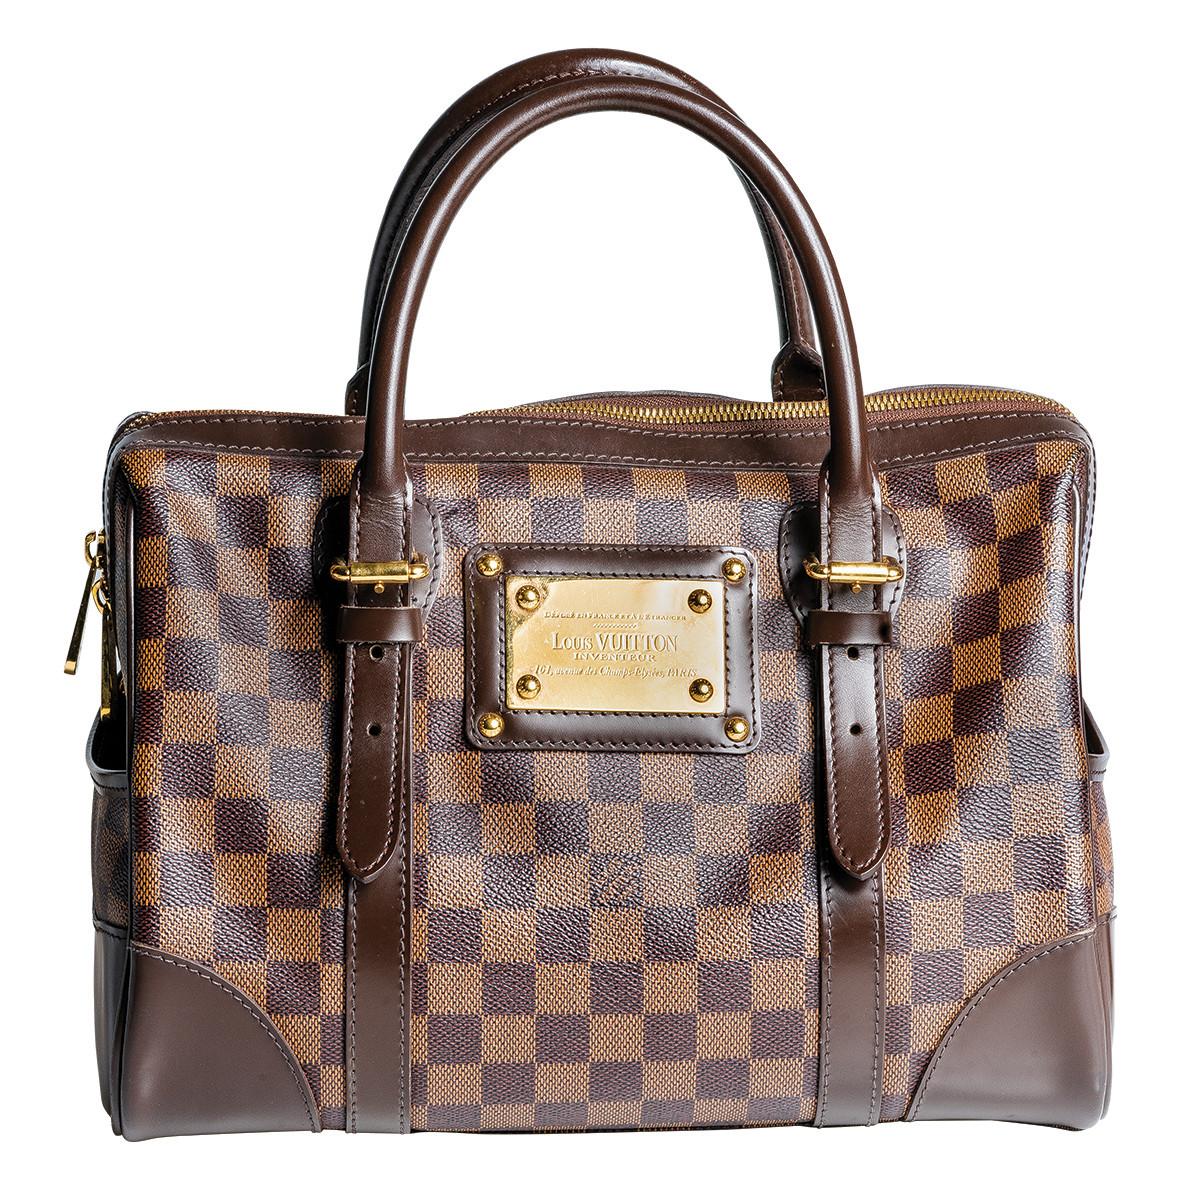 Vintage Louis Vuitton Damier Ebene Berkeley Bag